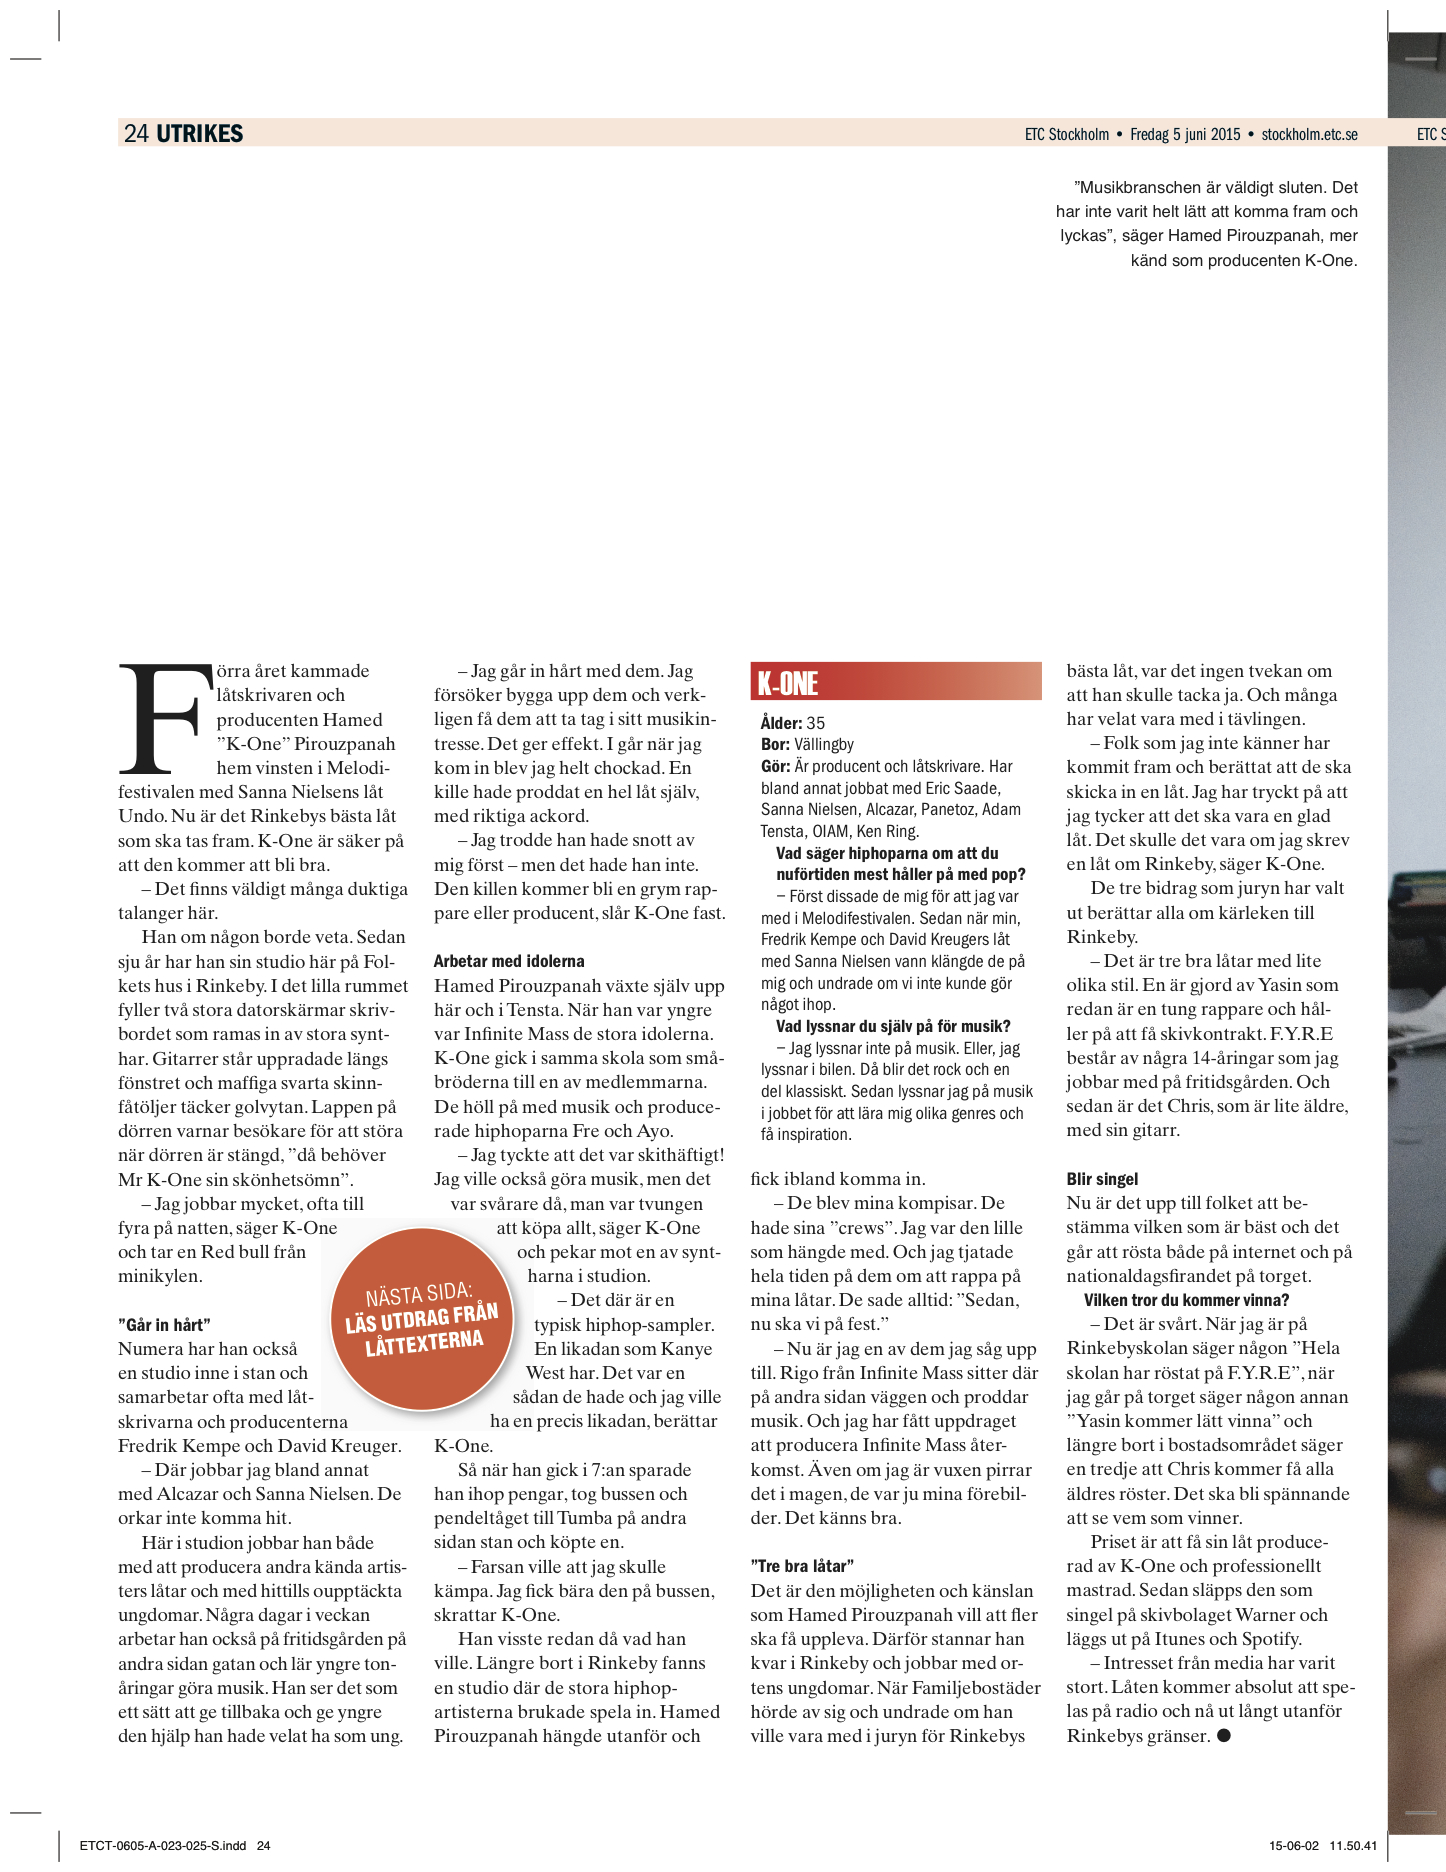 Sida 1- intervju med K-One i ETC Stockholm.jpg